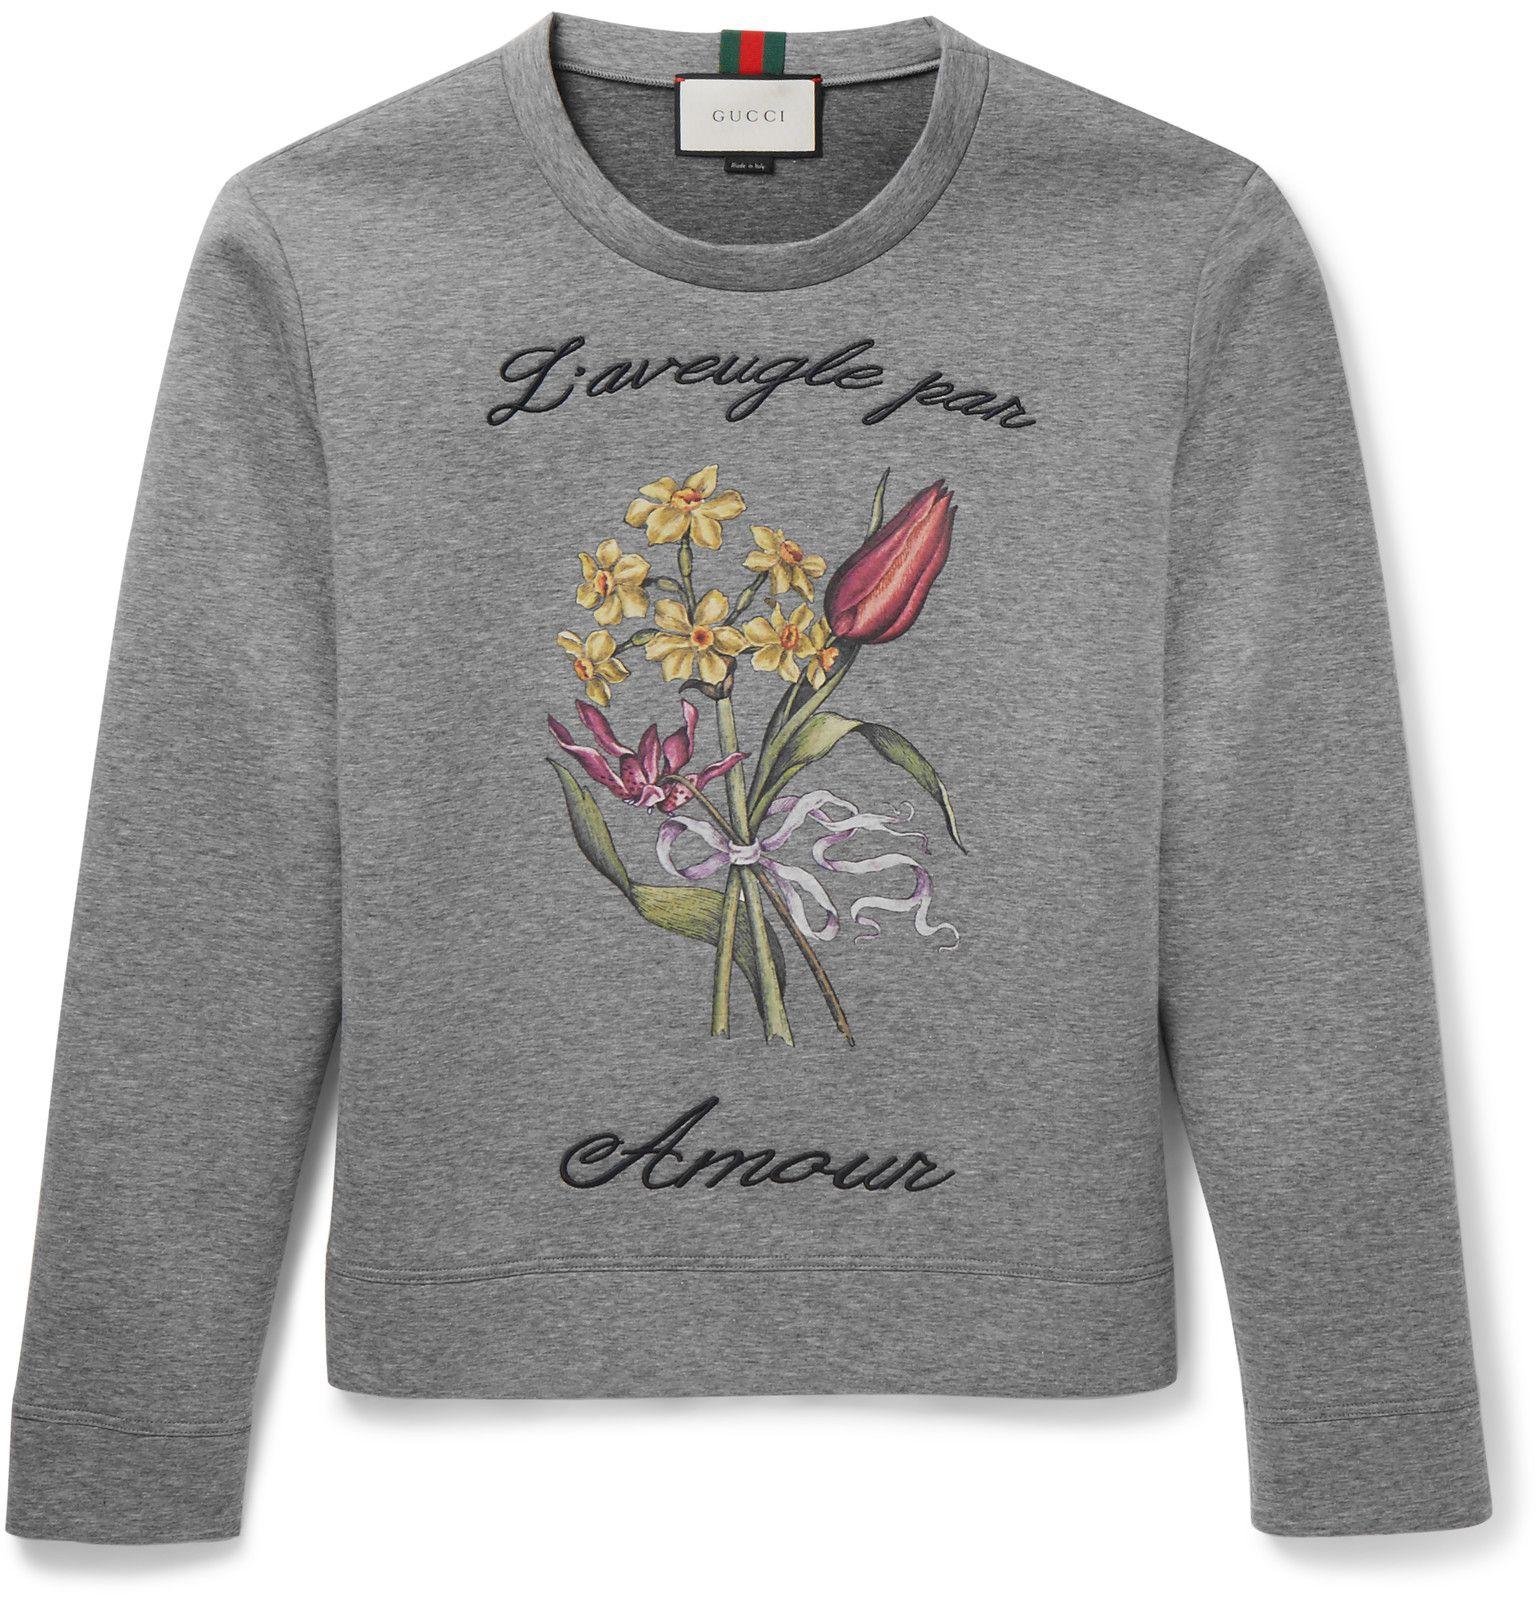 Gucci - Embroidered Cotton Sweatshirt